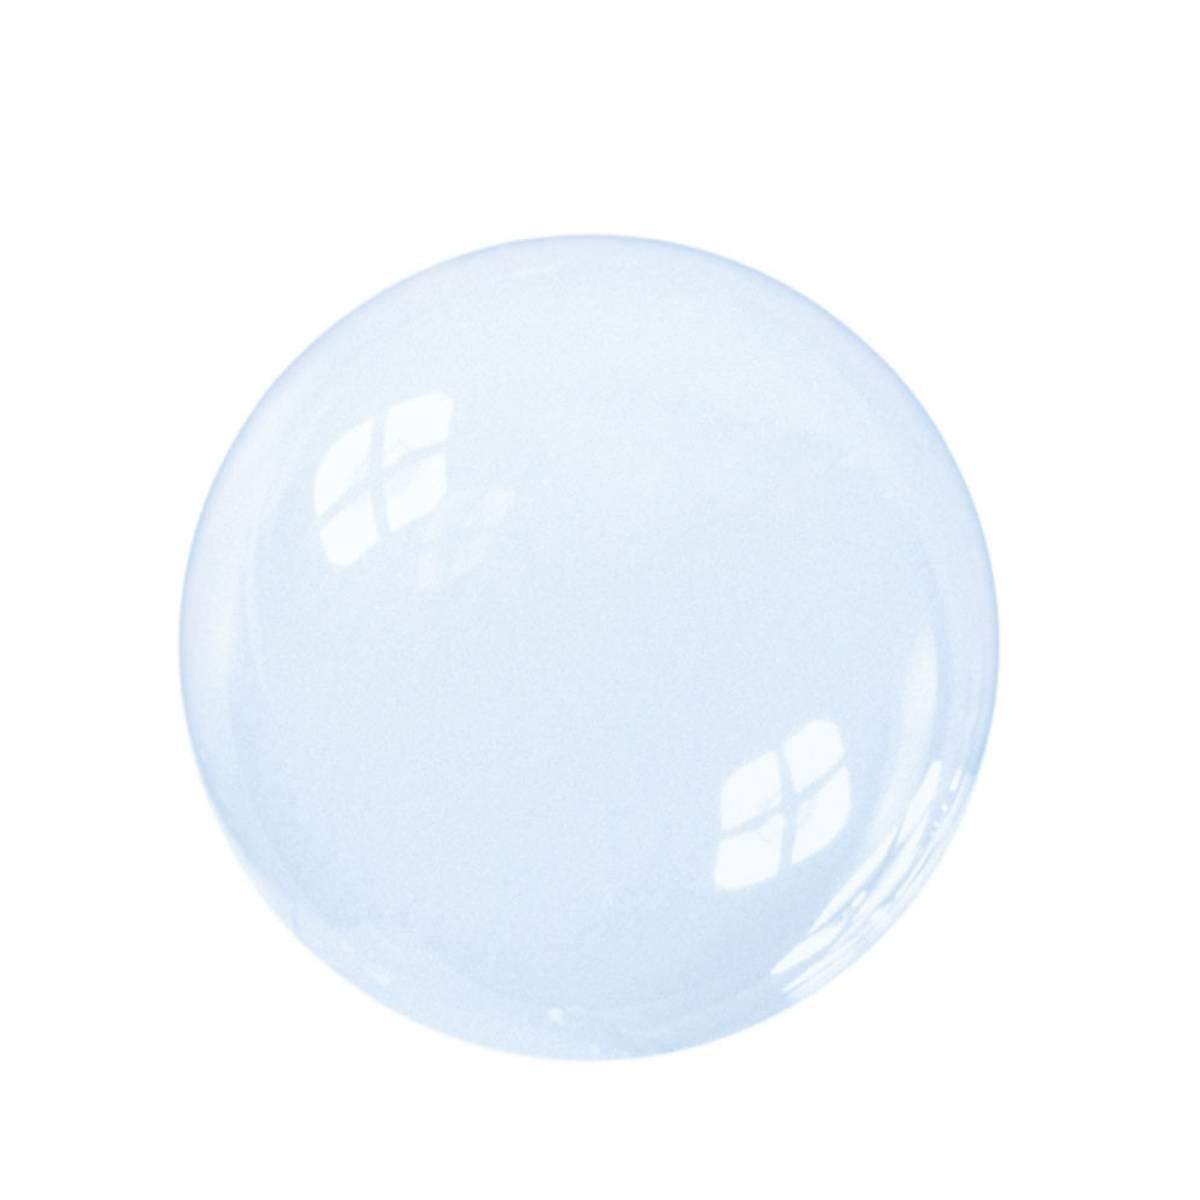 La Roche Posay ProduktSide Kerium DS Anti-skælplejesshampoo